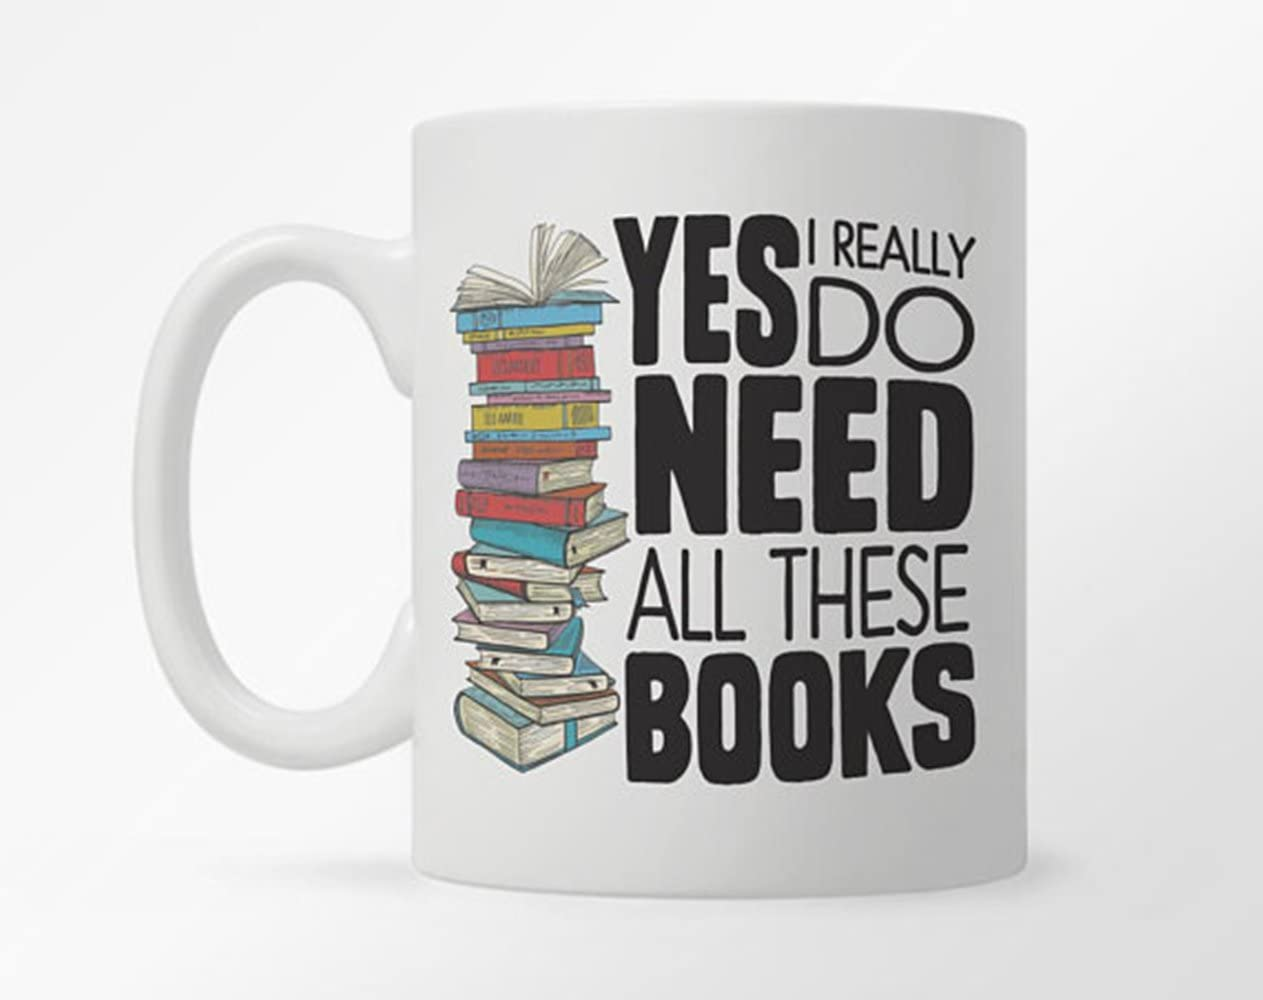 Amazon.com: Book Lover Gift, Book Mug, Bookish Mug, Bookish Gifts, Reading  Coffee Mug, Bookworm Mug, Bookworm Gifts, Gift For Librarian, Book Life Mug,  Ceramic Cup 11oz: Kitchen & Dining